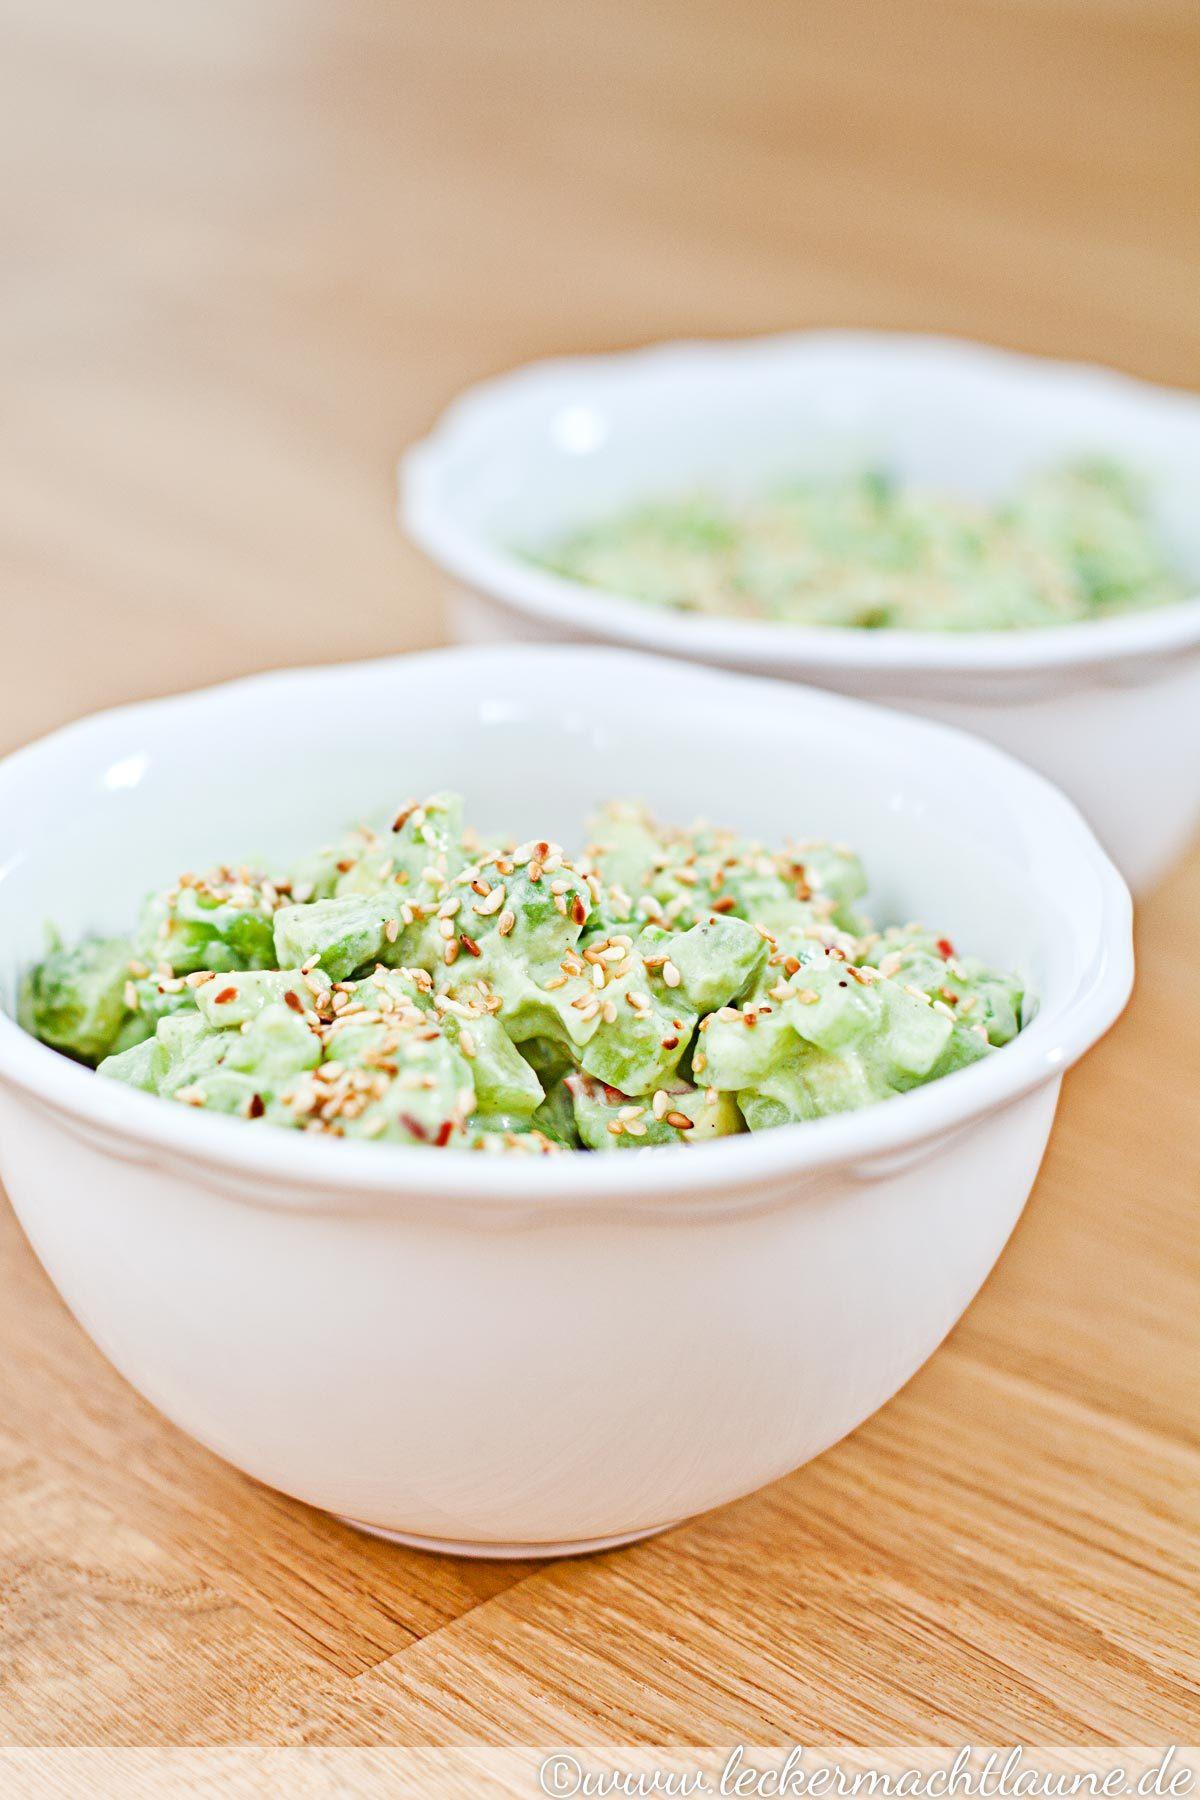 15 salat rezepte silvester beilagen lecker macht laune. Black Bedroom Furniture Sets. Home Design Ideas